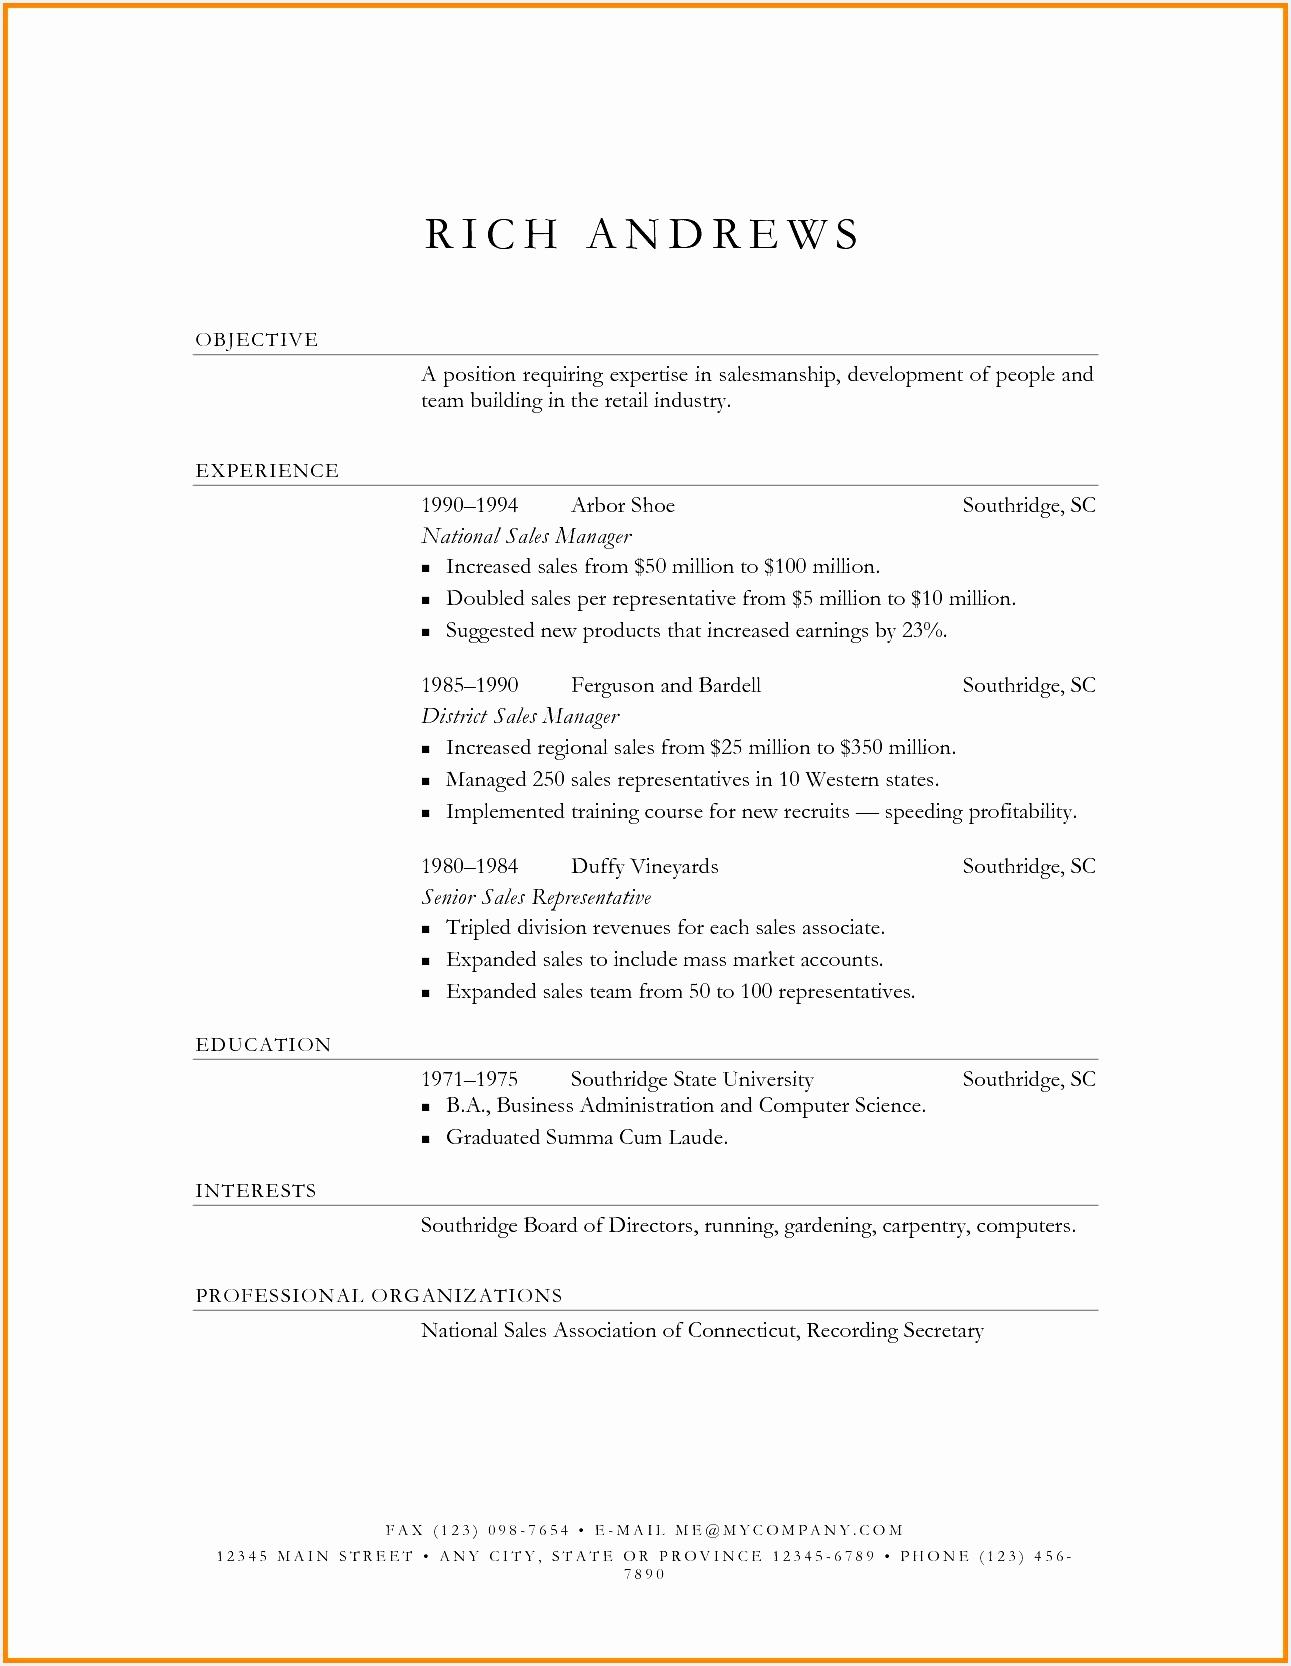 Mock Resume Templates Lovely Free Resume Cover Letter or Od16661291